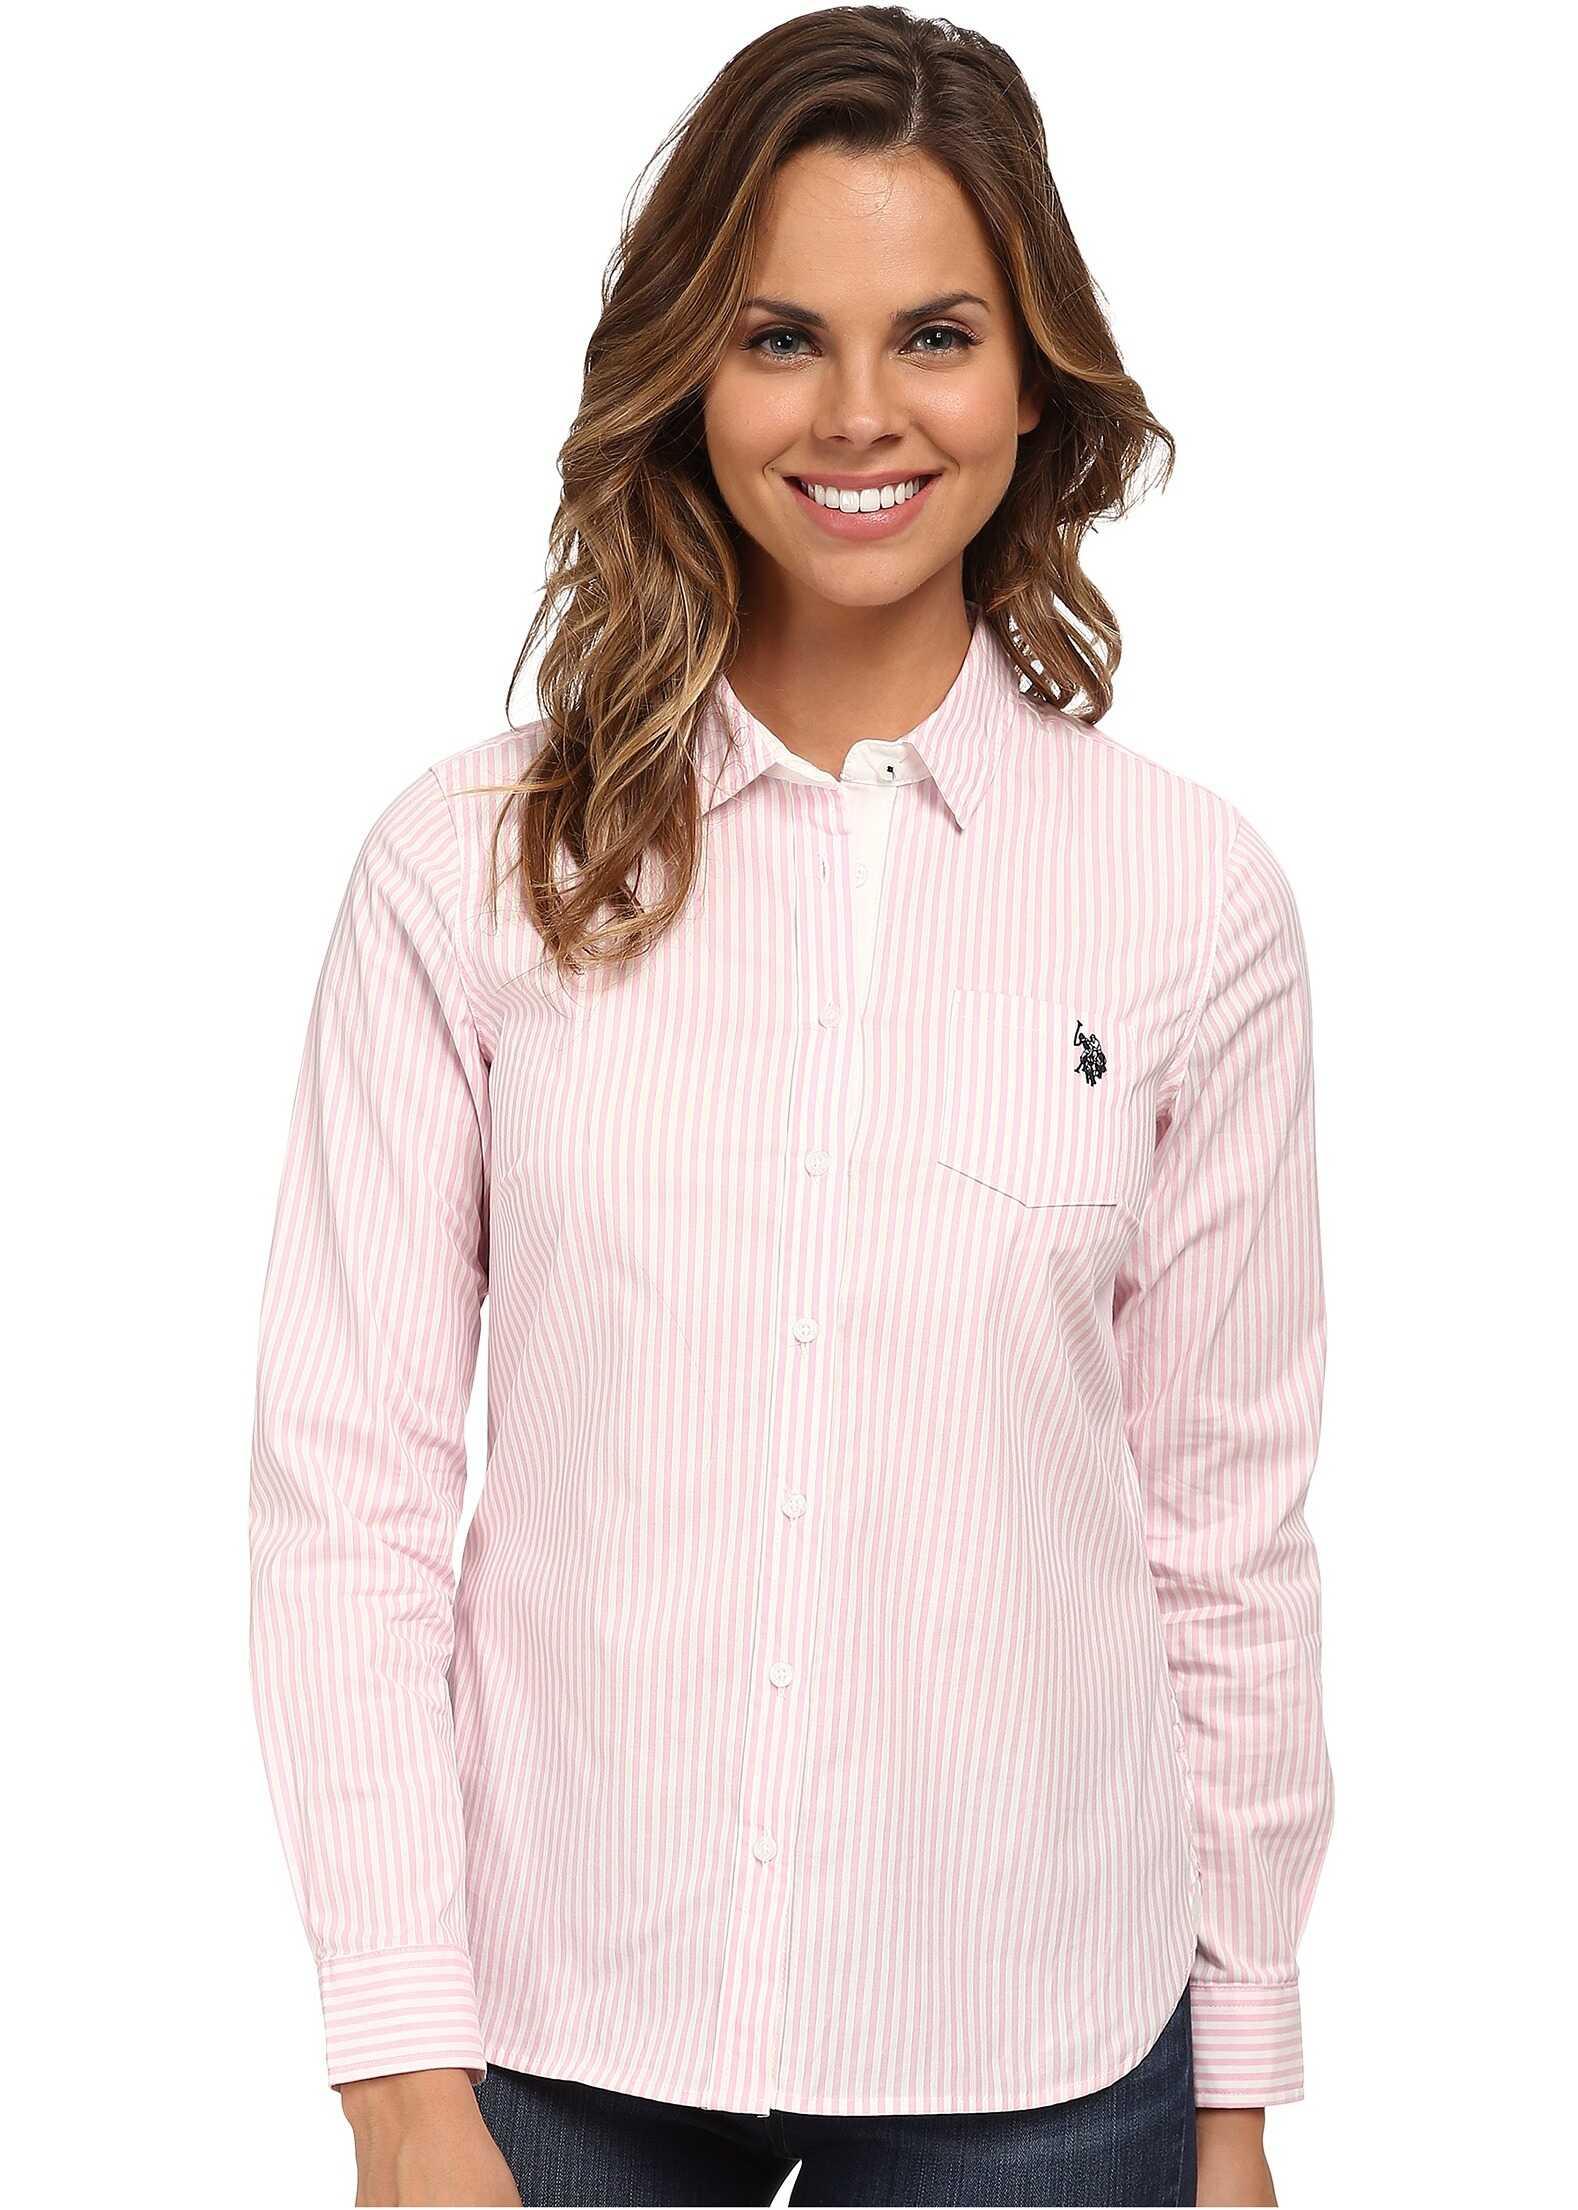 U.S. POLO ASSN. Long Sleeve Vertical Stripe Shirt Prism Pink